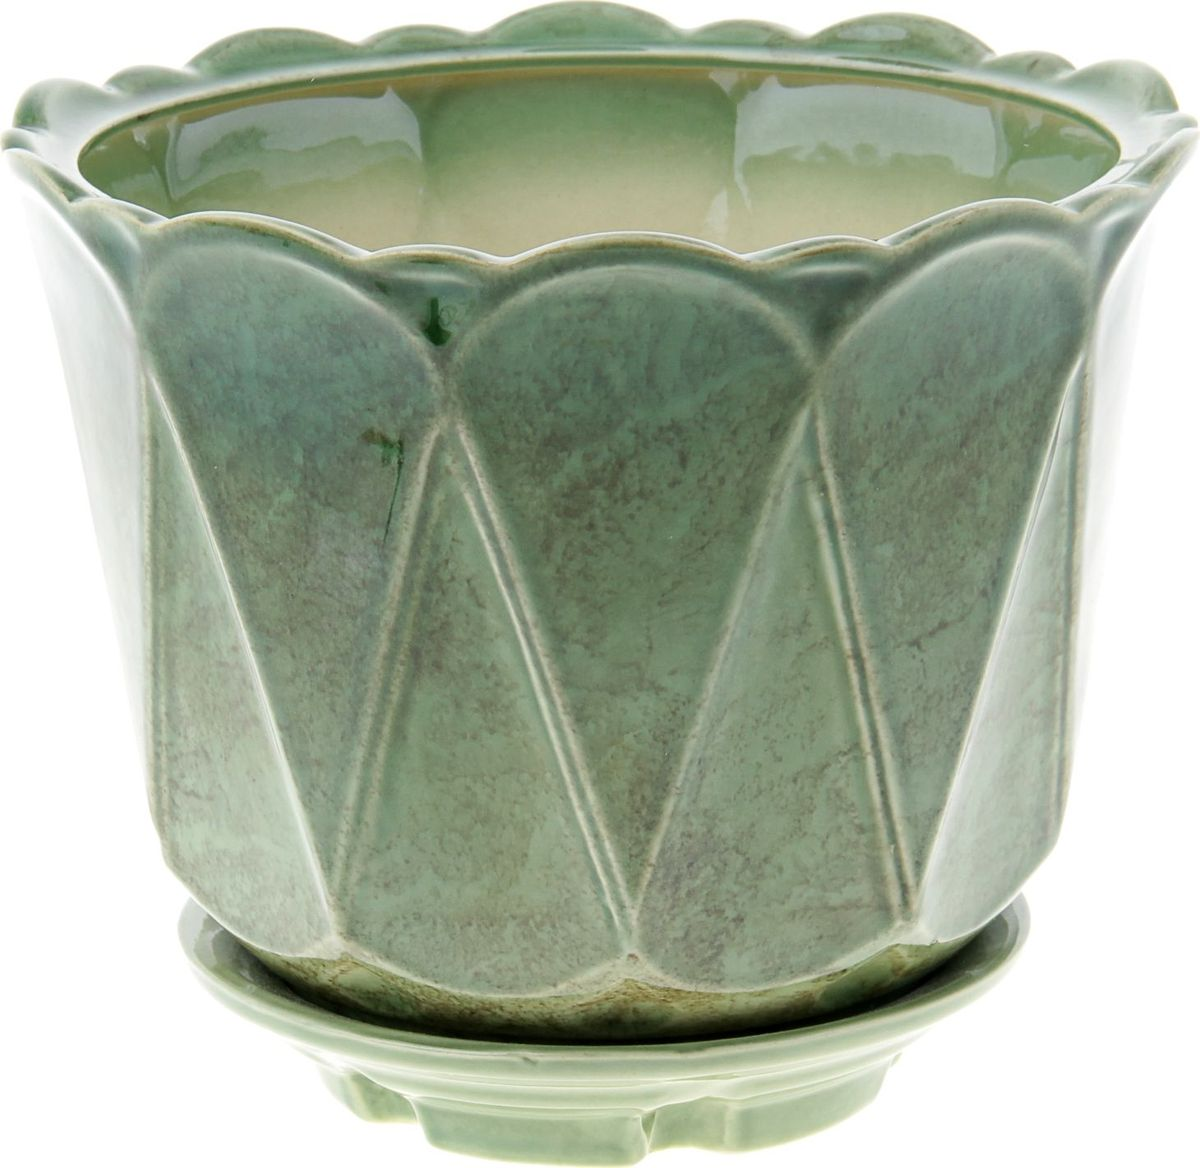 Кашпо Берта, цвет: зеленый, 3,7 л840527